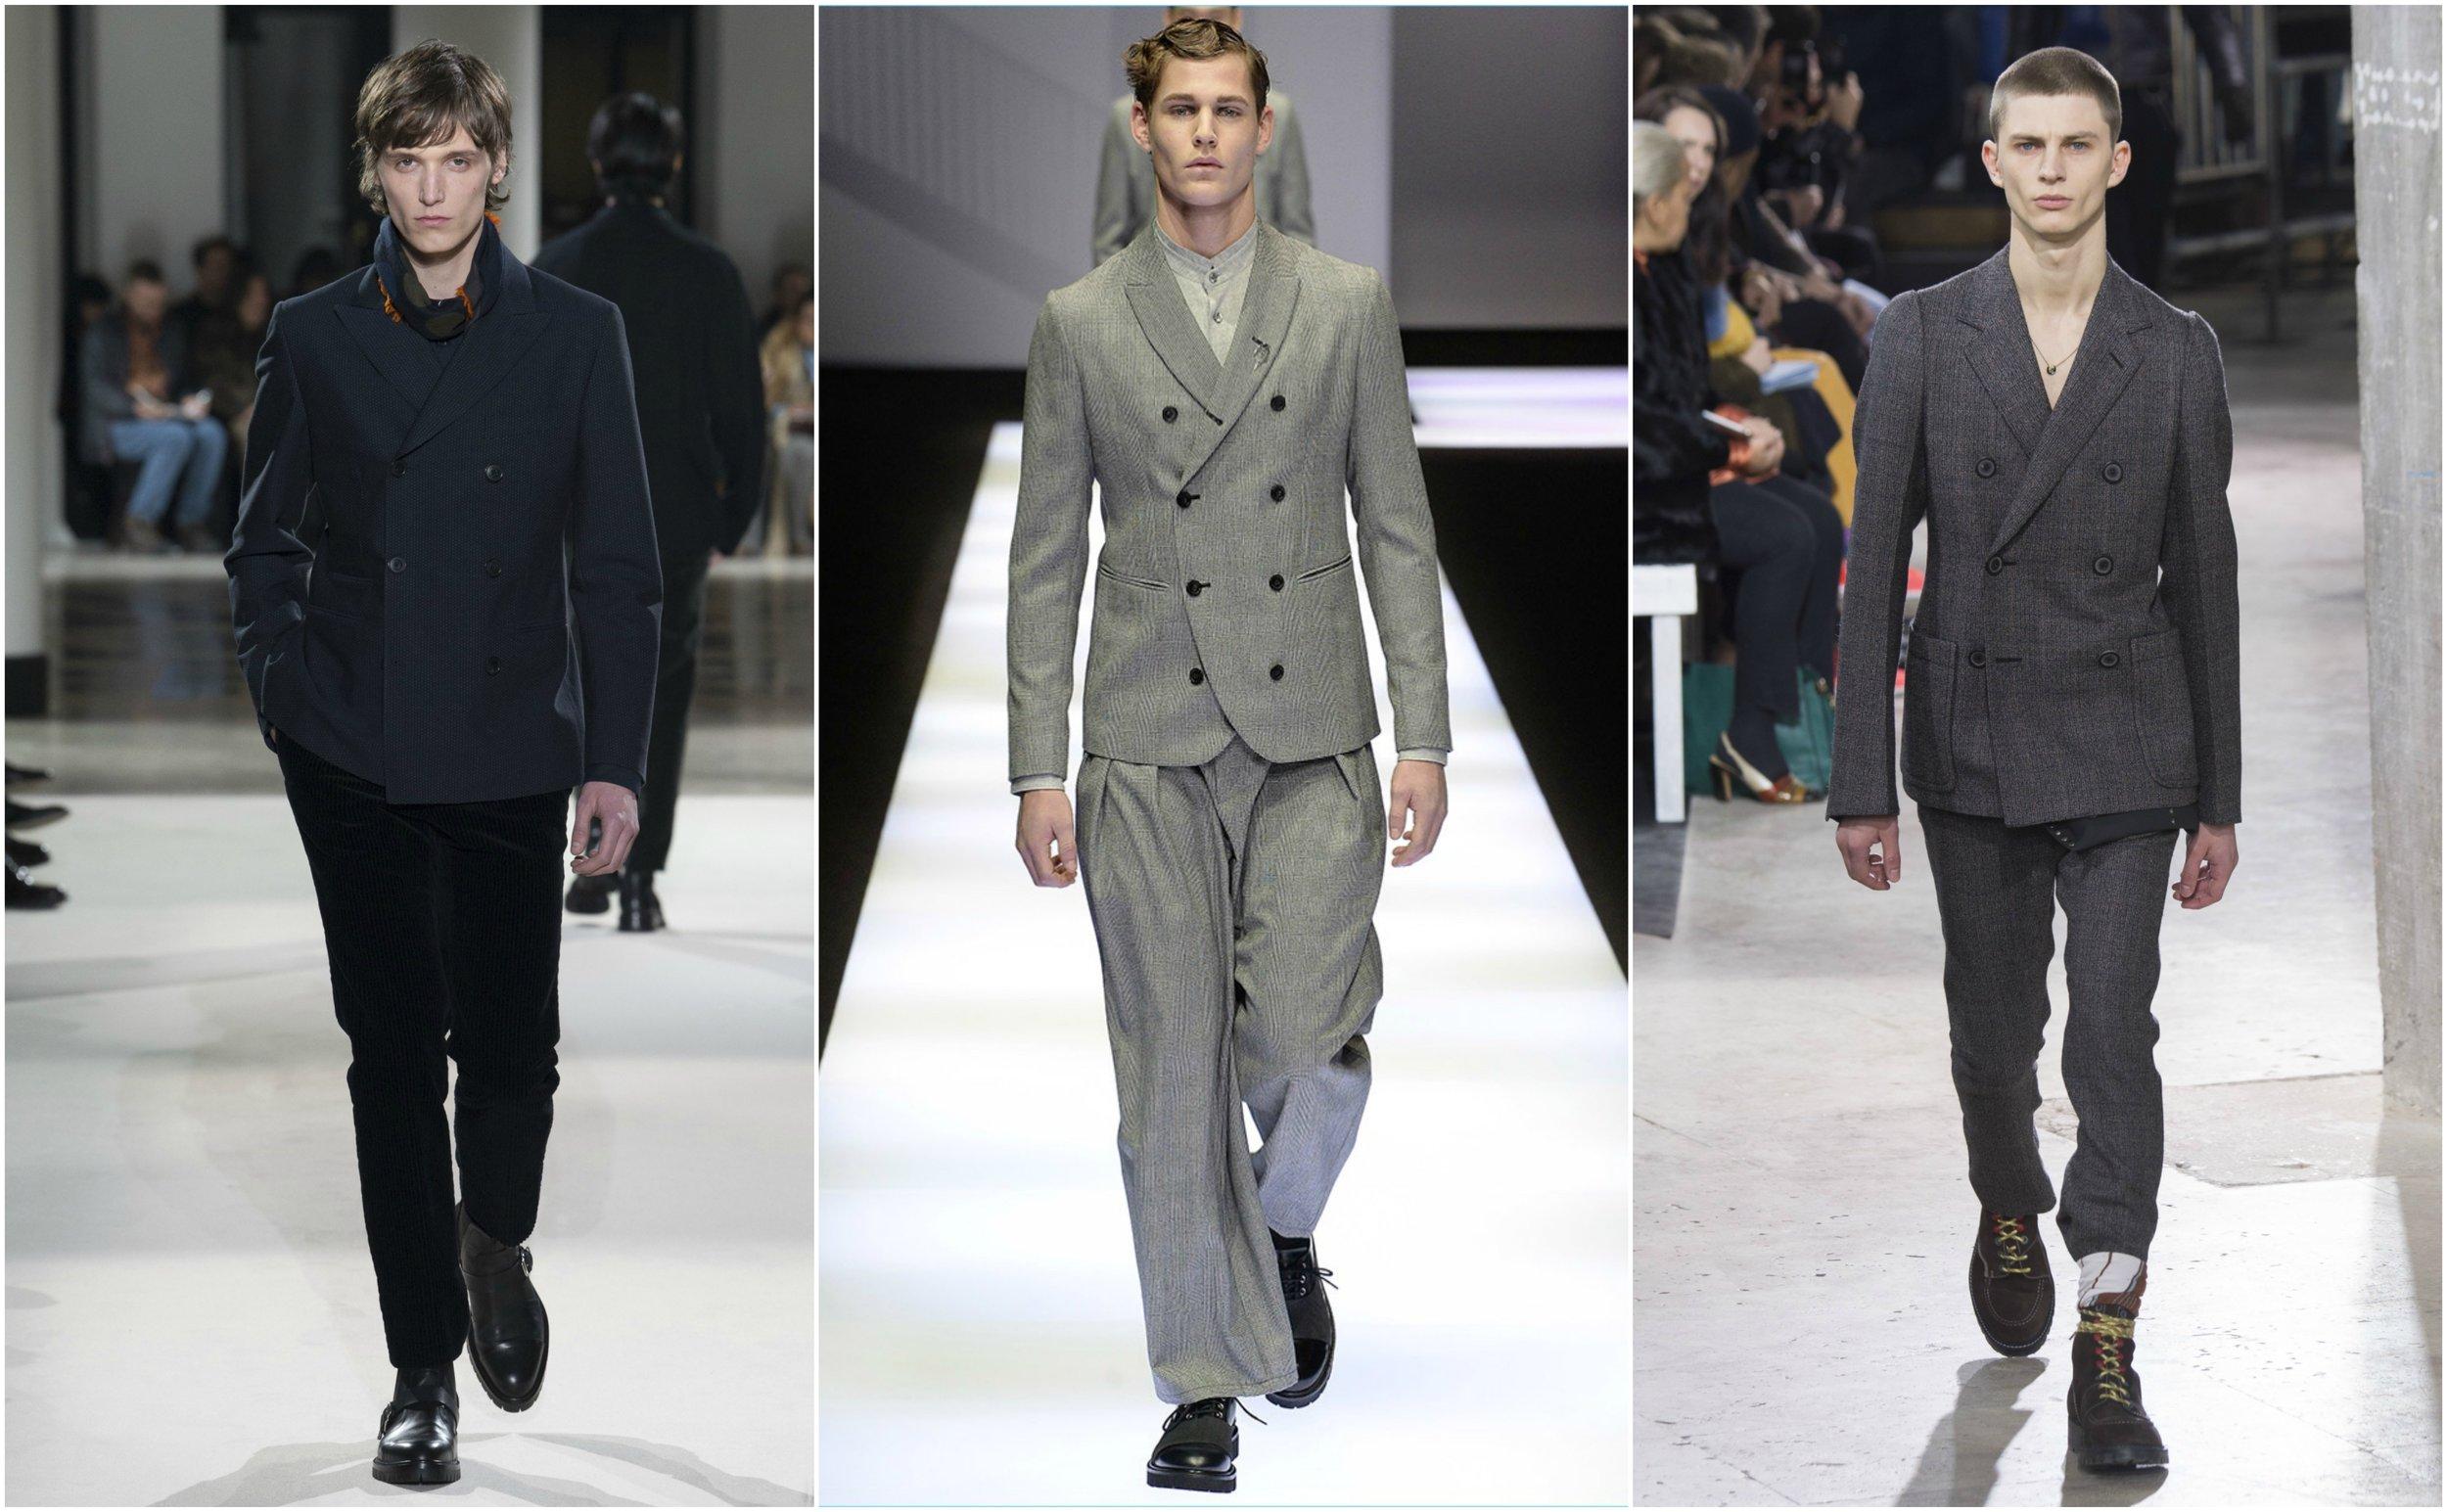 From left to right: Hermès ,  Giorgio Armani , and  Lanvin